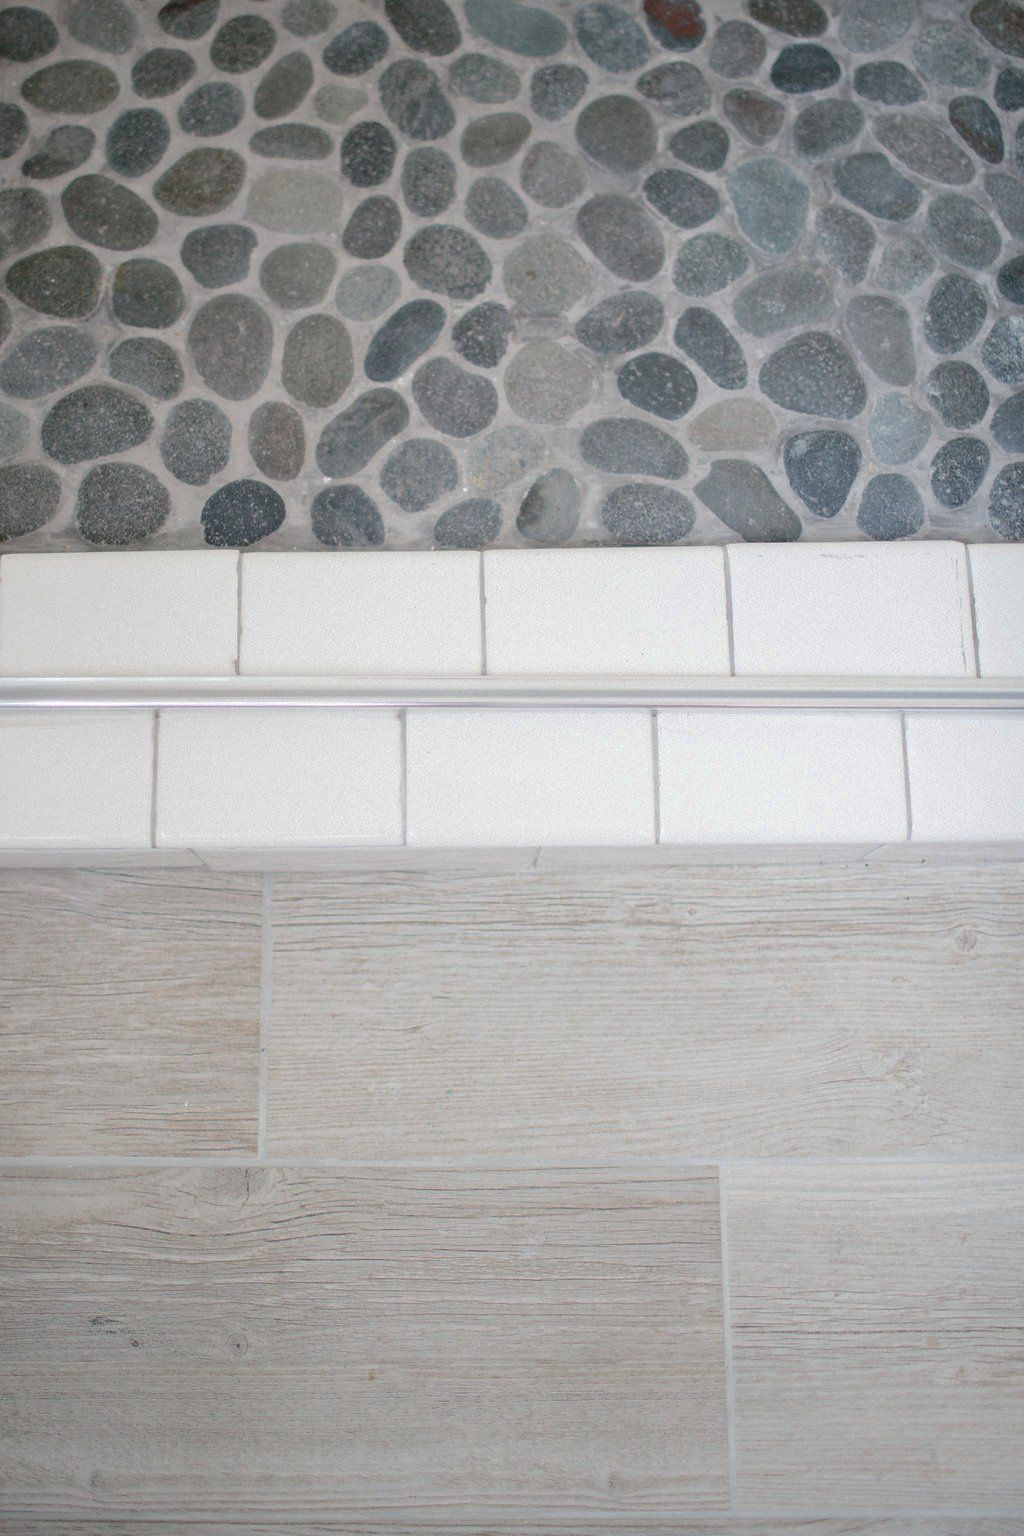 Our Master Bathroom Renovation Reveal   Mosaic floors, Wall tiles ...